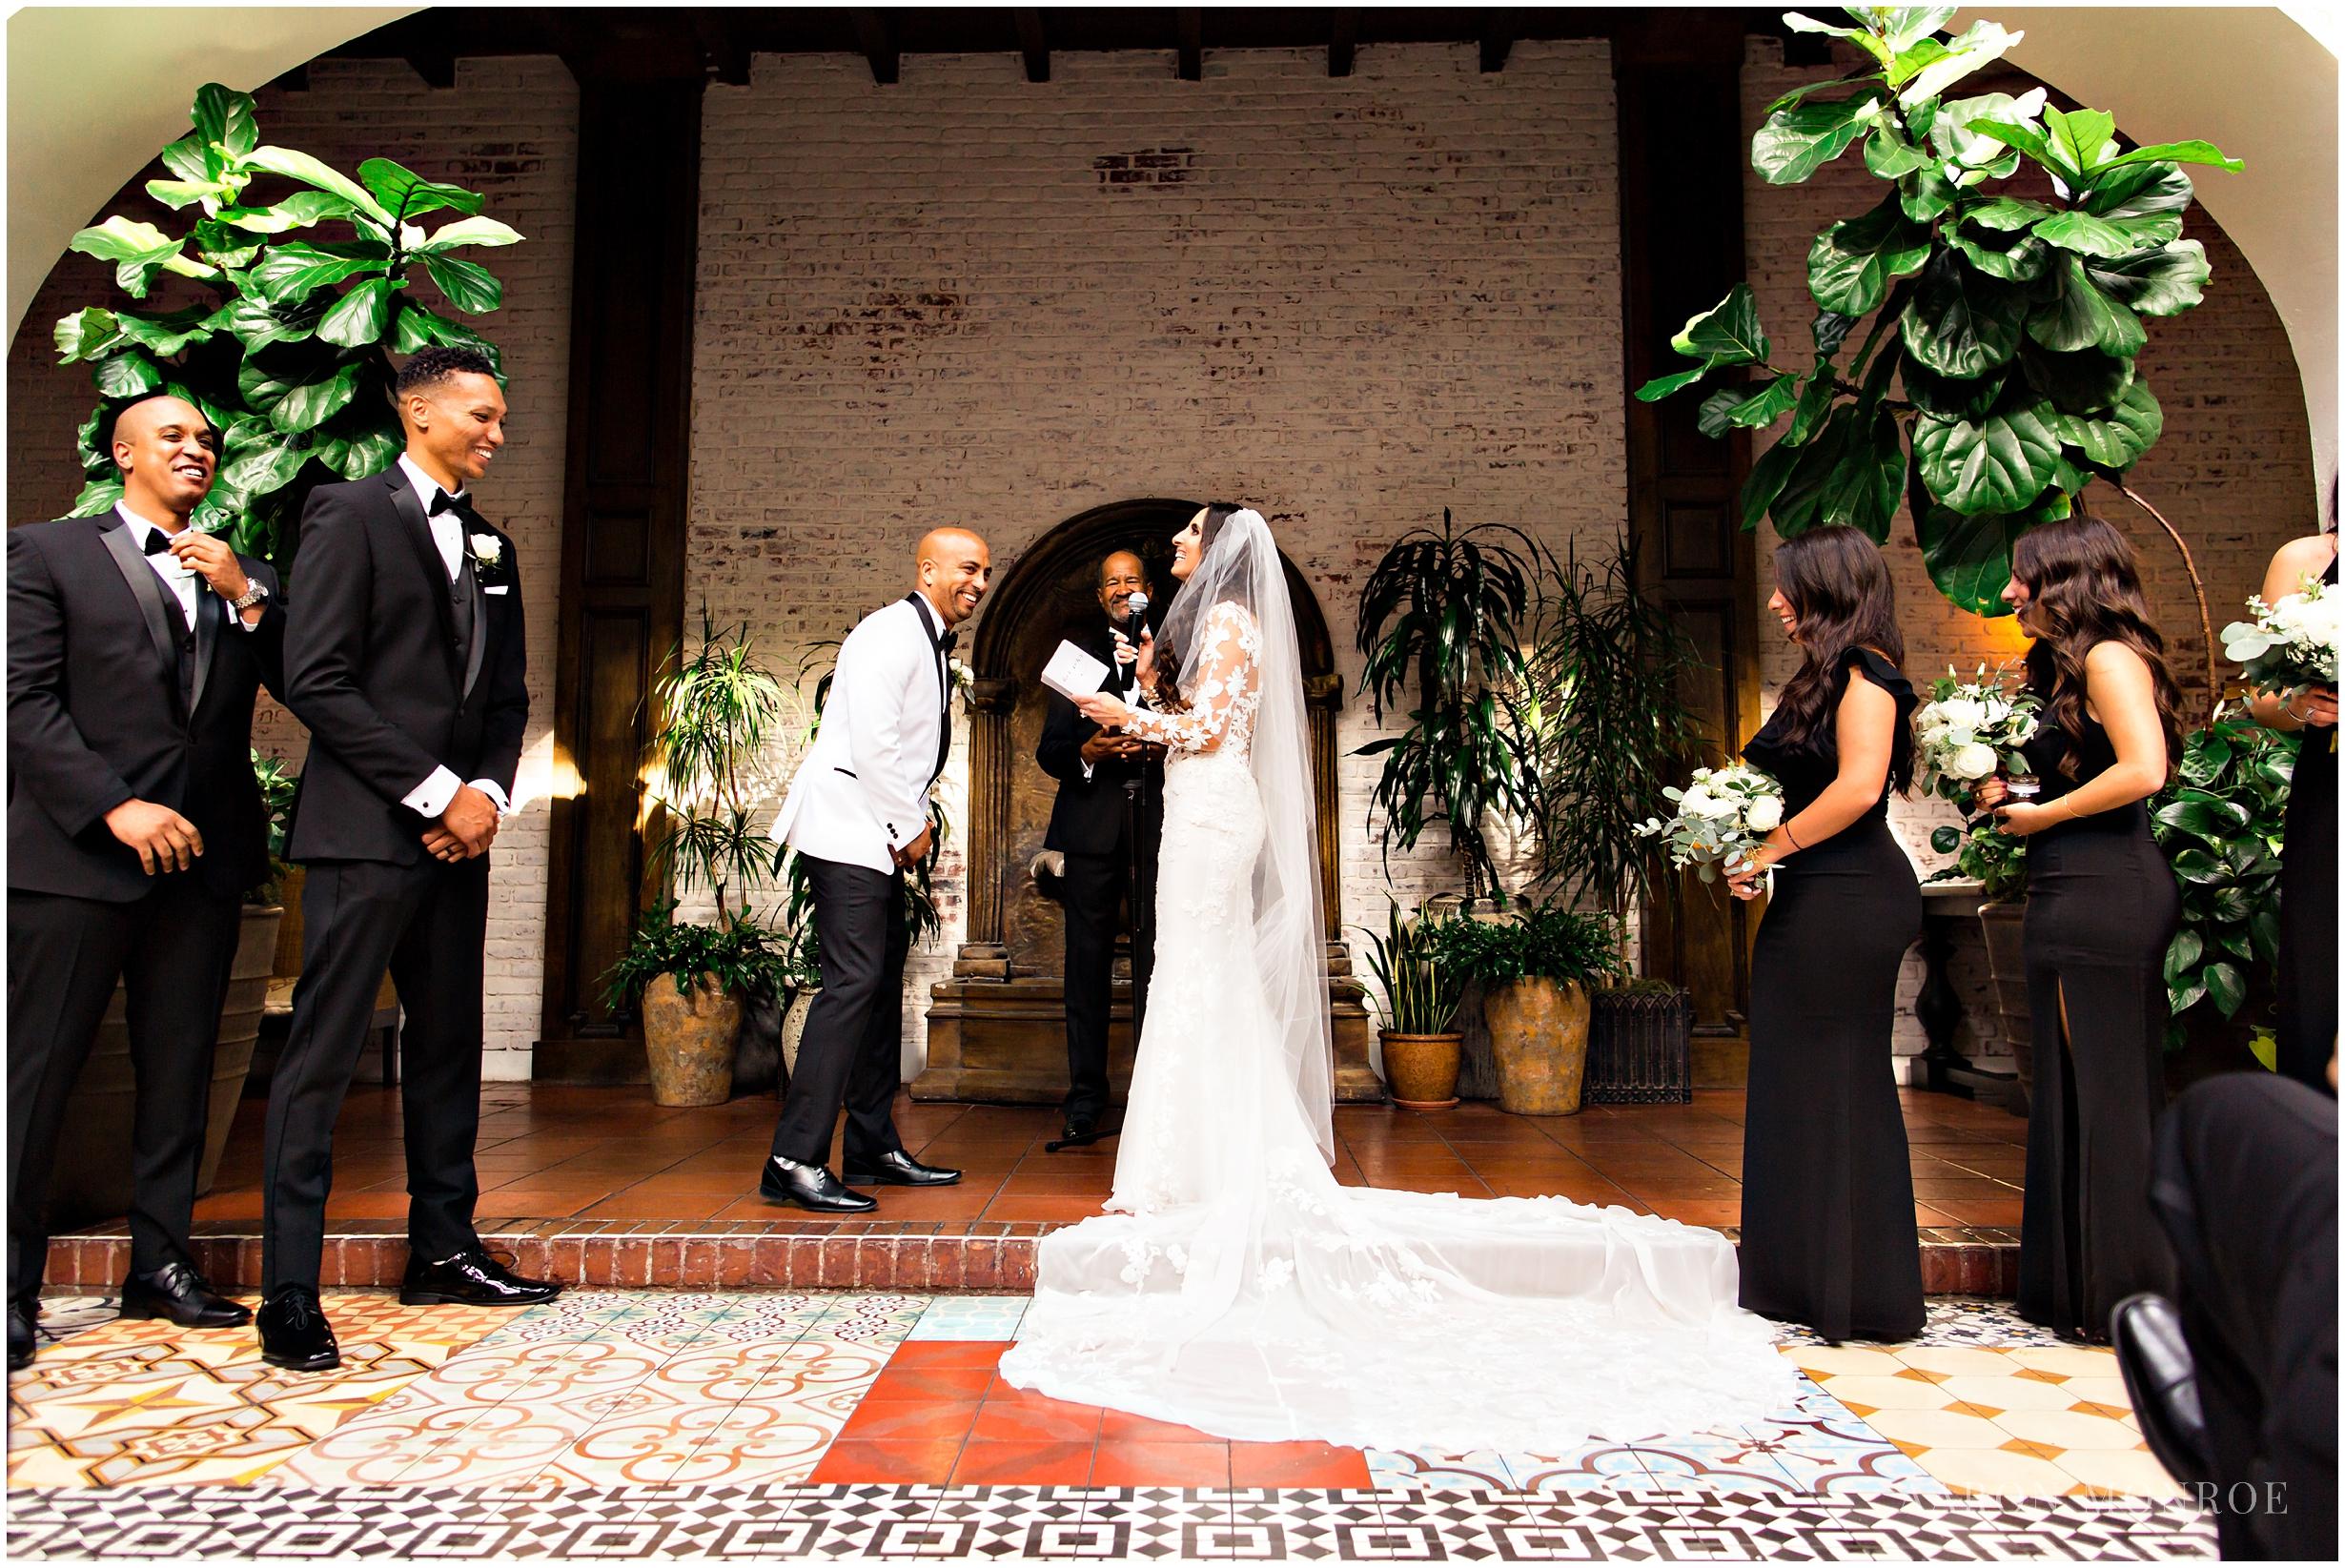 Ebell_Long_Beach_Wedding_Photography_0837.jpg